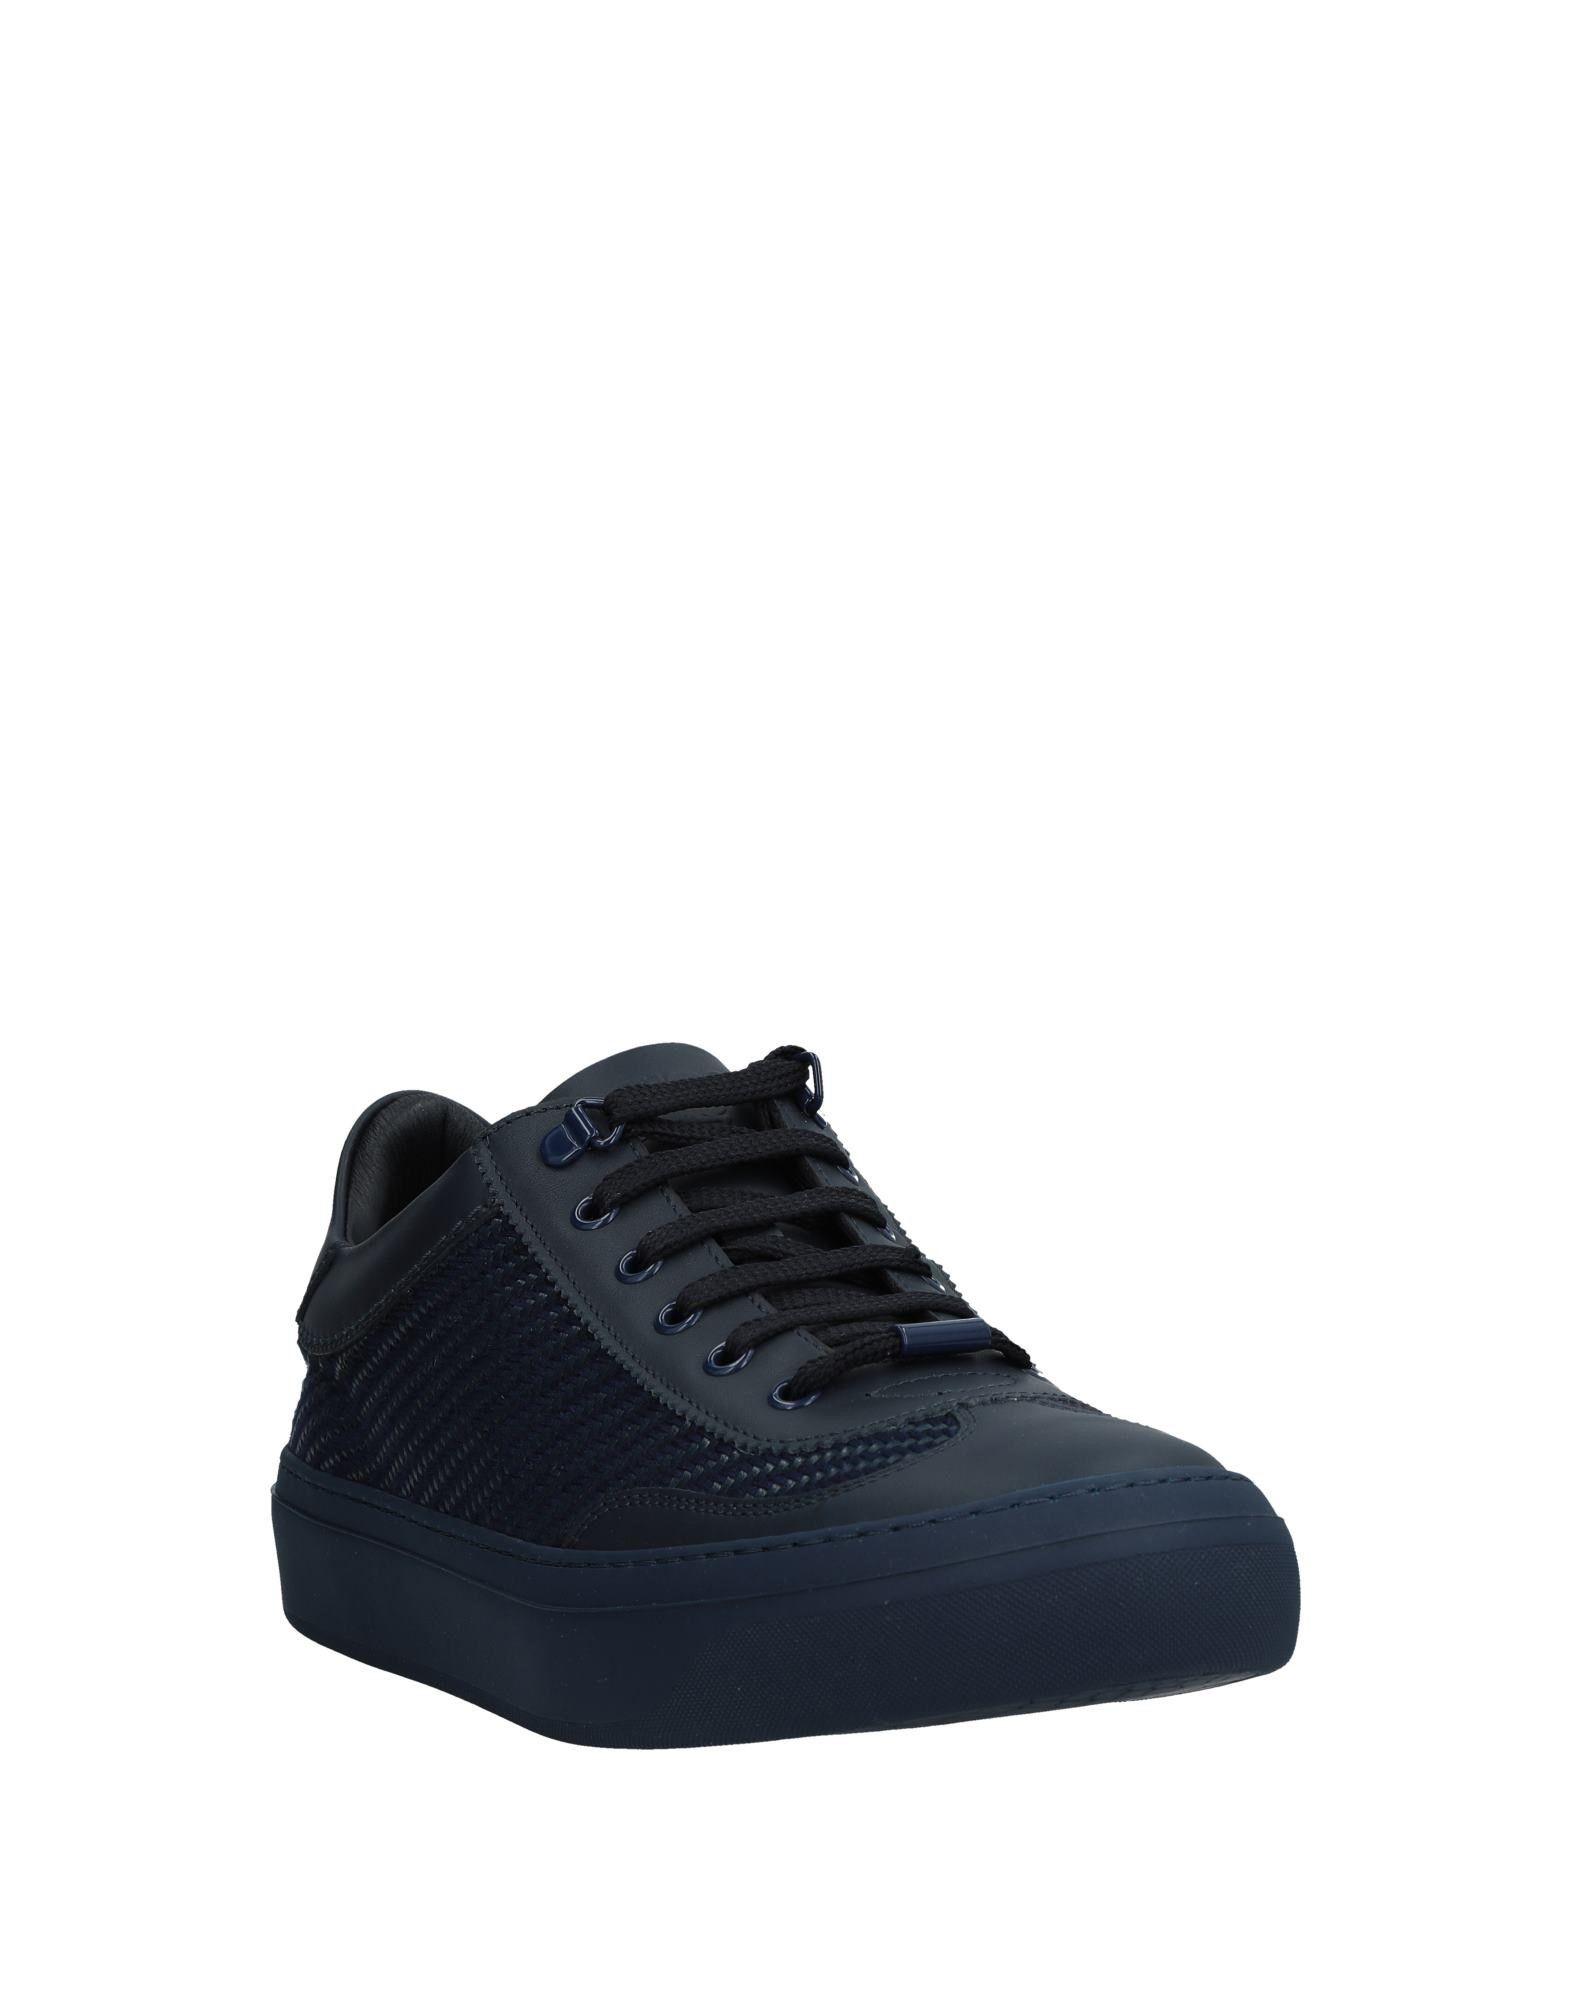 Jimmy Choo Sneakers Herren Herren Sneakers  11530530NH a158d5